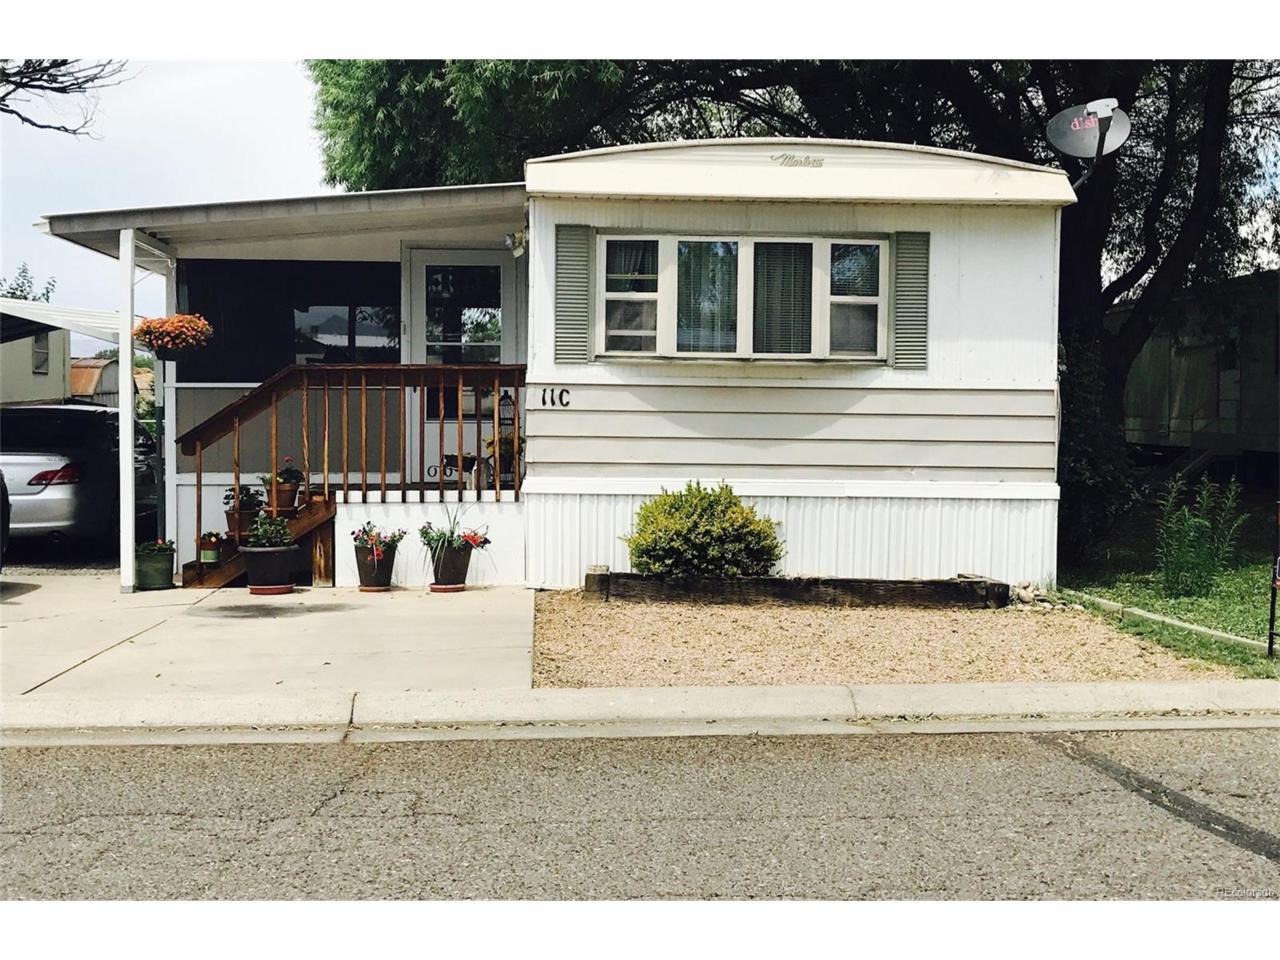 516 2980 Road 11C, Grand Junction, CO 81504 (MLS #5282423) :: 8z Real Estate